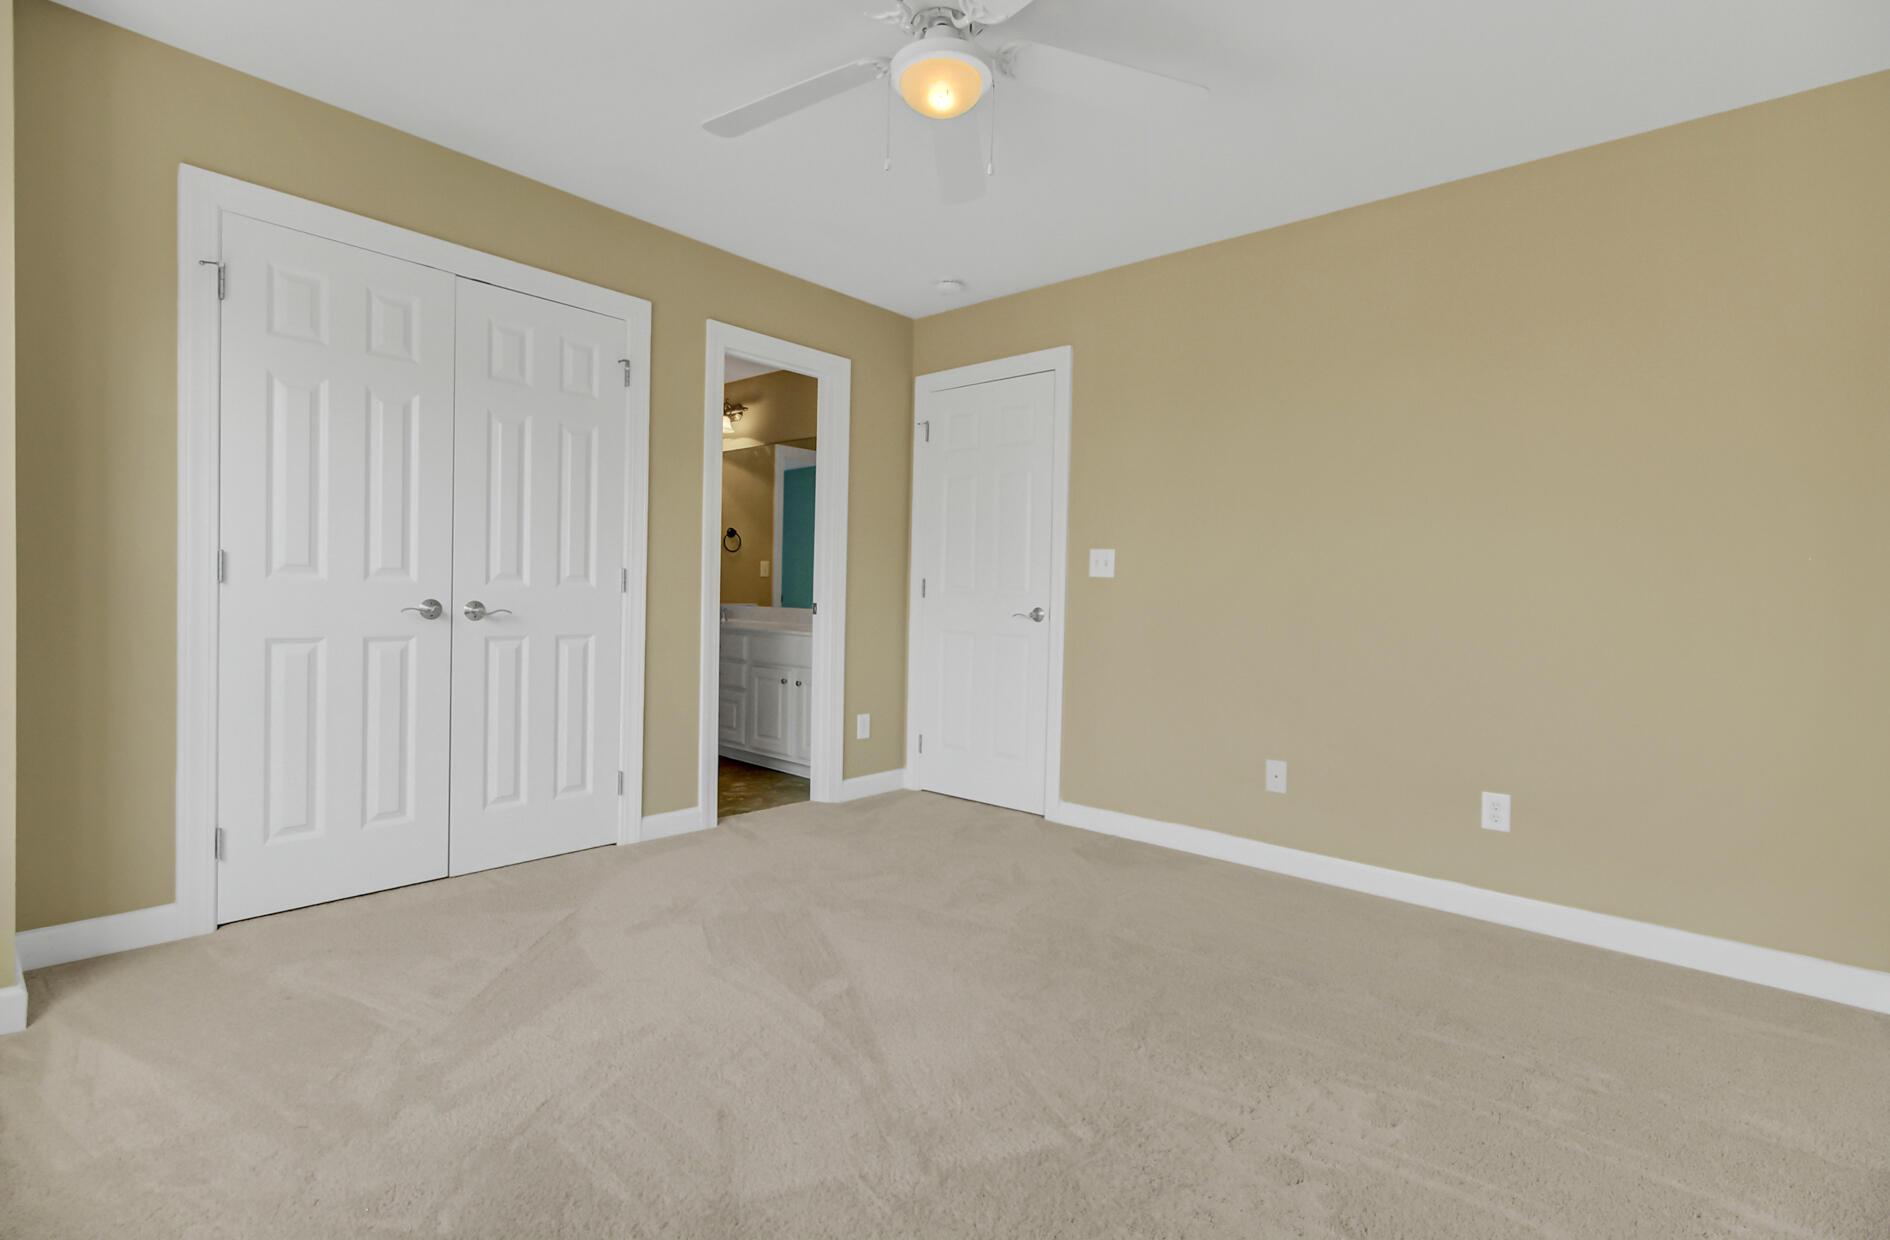 Marsh Cove Homes For Sale - 2928 Riverwood, Mount Pleasant, SC - 14